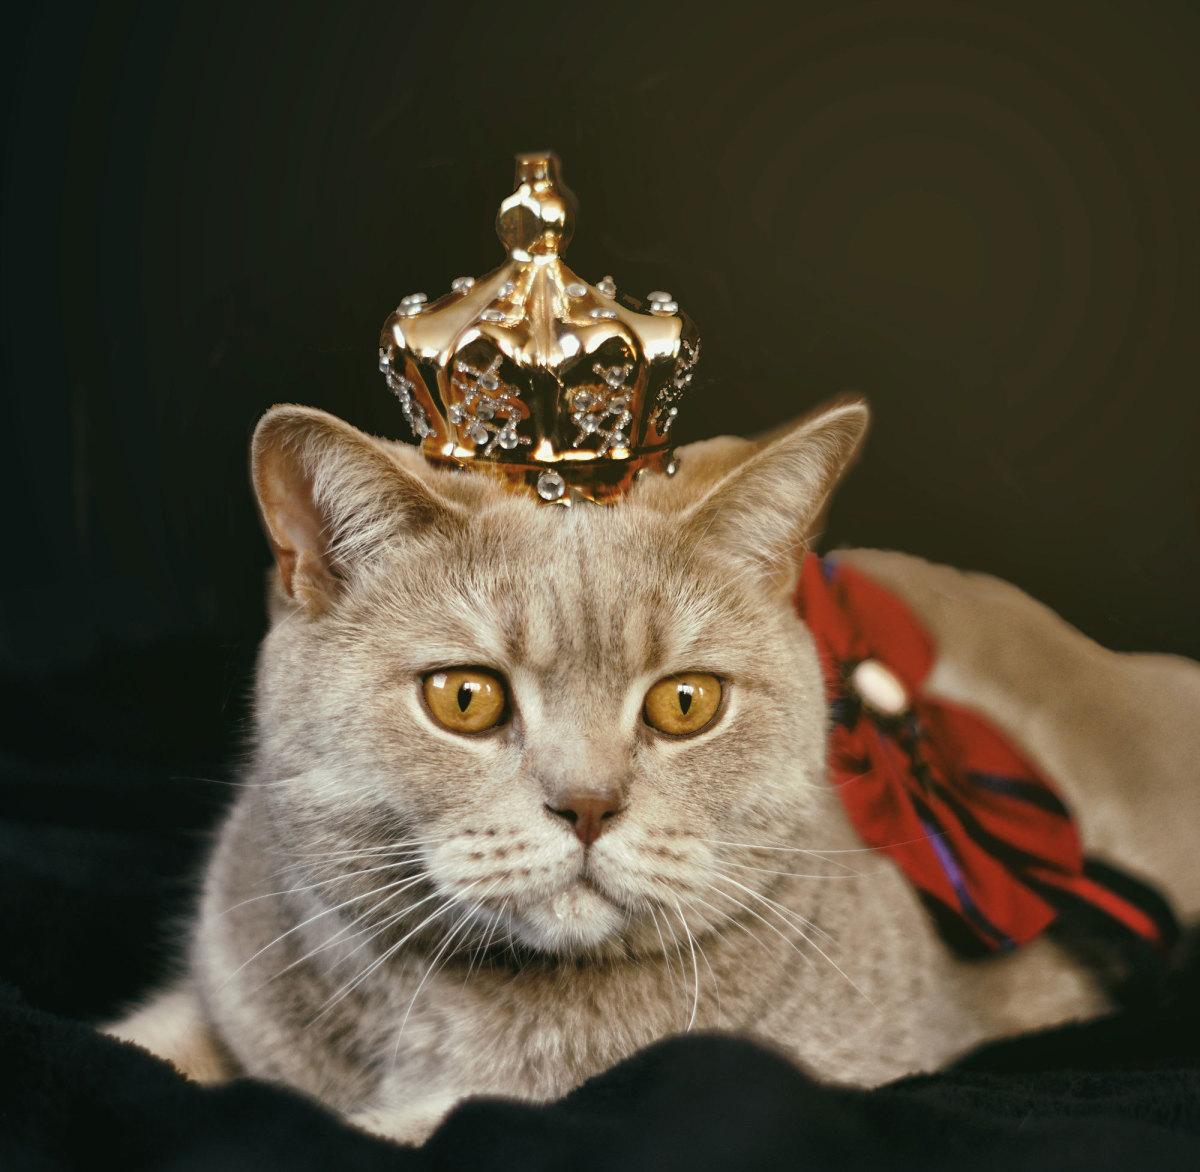 Elvis is sitting on his throne.